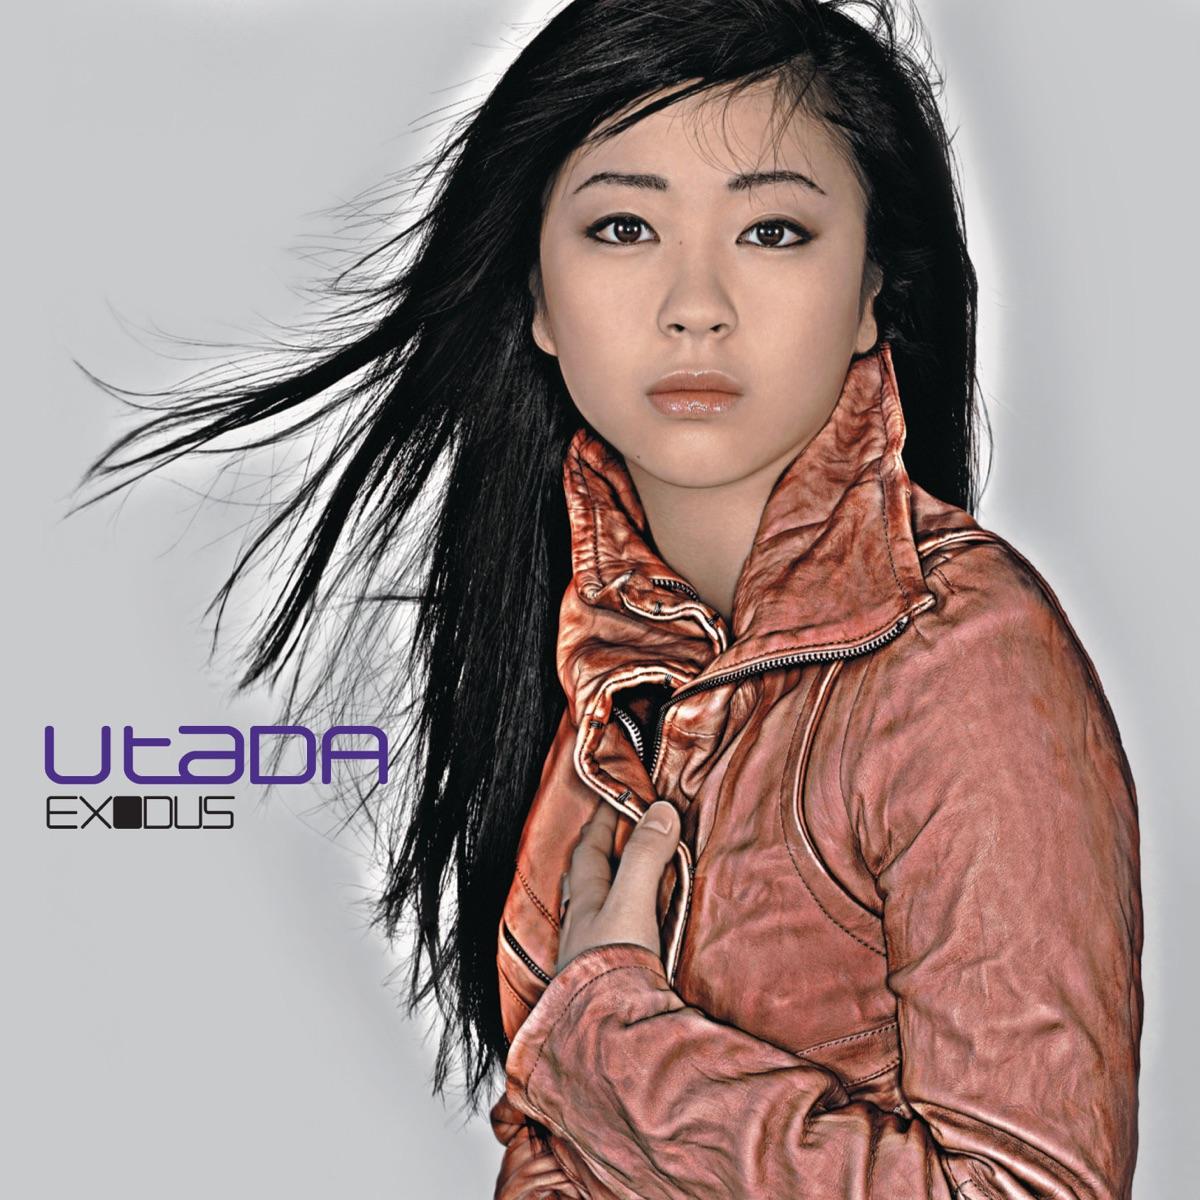 Exodus Utada Hikaru CD cover